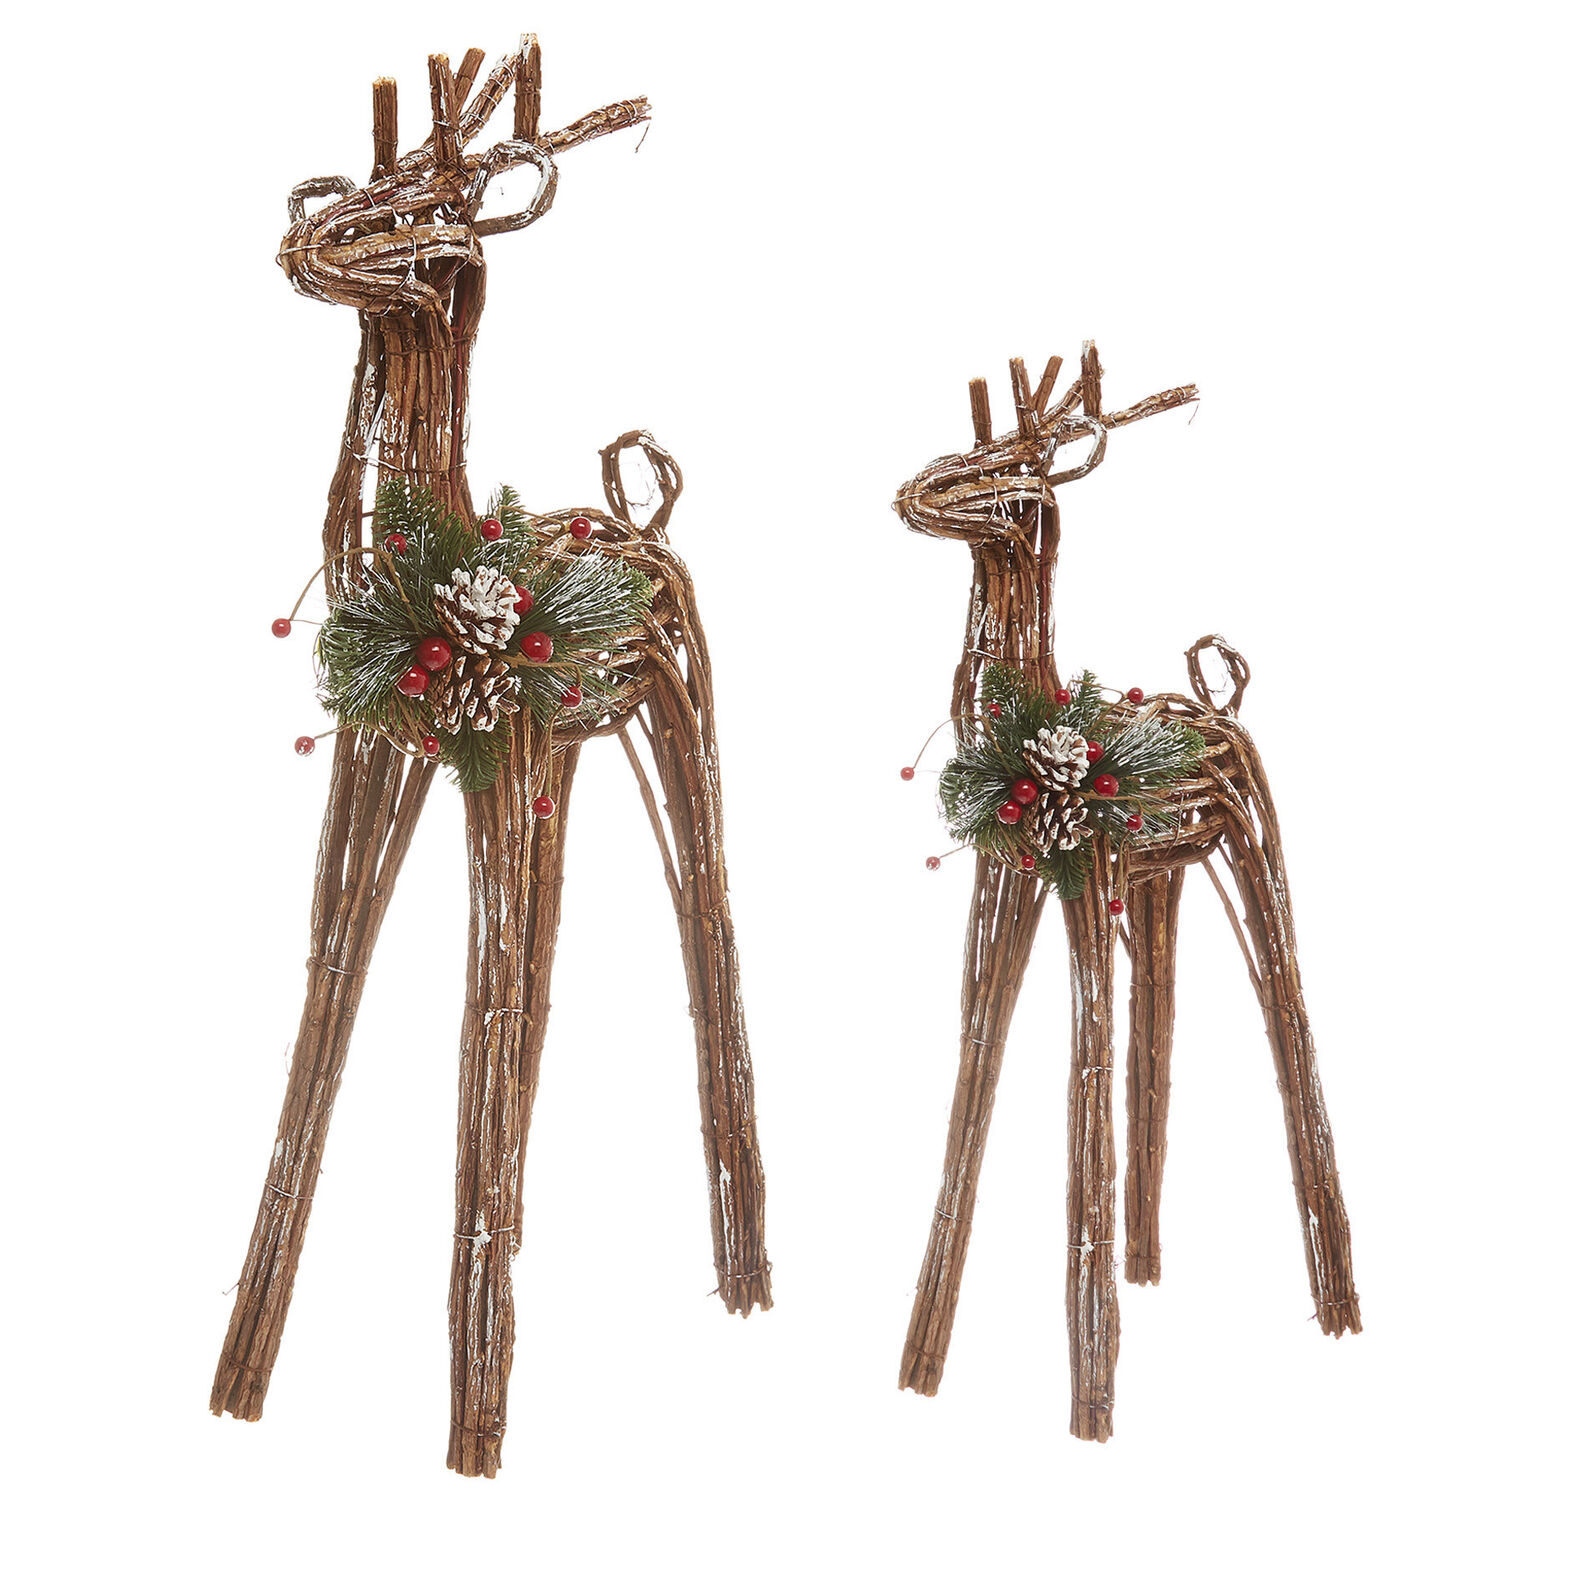 Hand-made decorative reindeer in vine wood